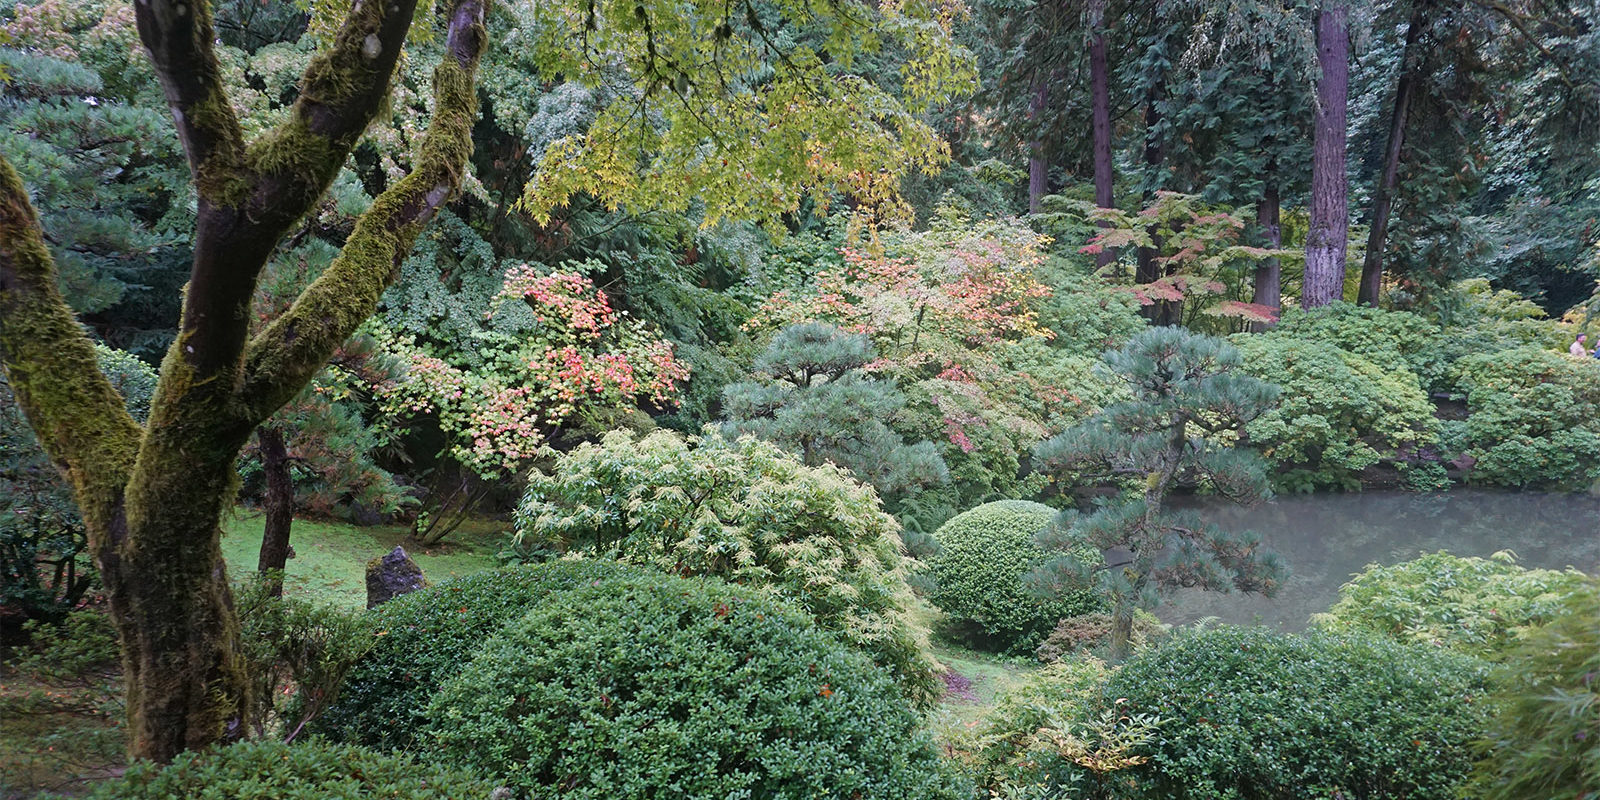 Portland Japanese Garden Early Fall Colors by Tyler Quinn - 2018-10-09 - DSC00903_low